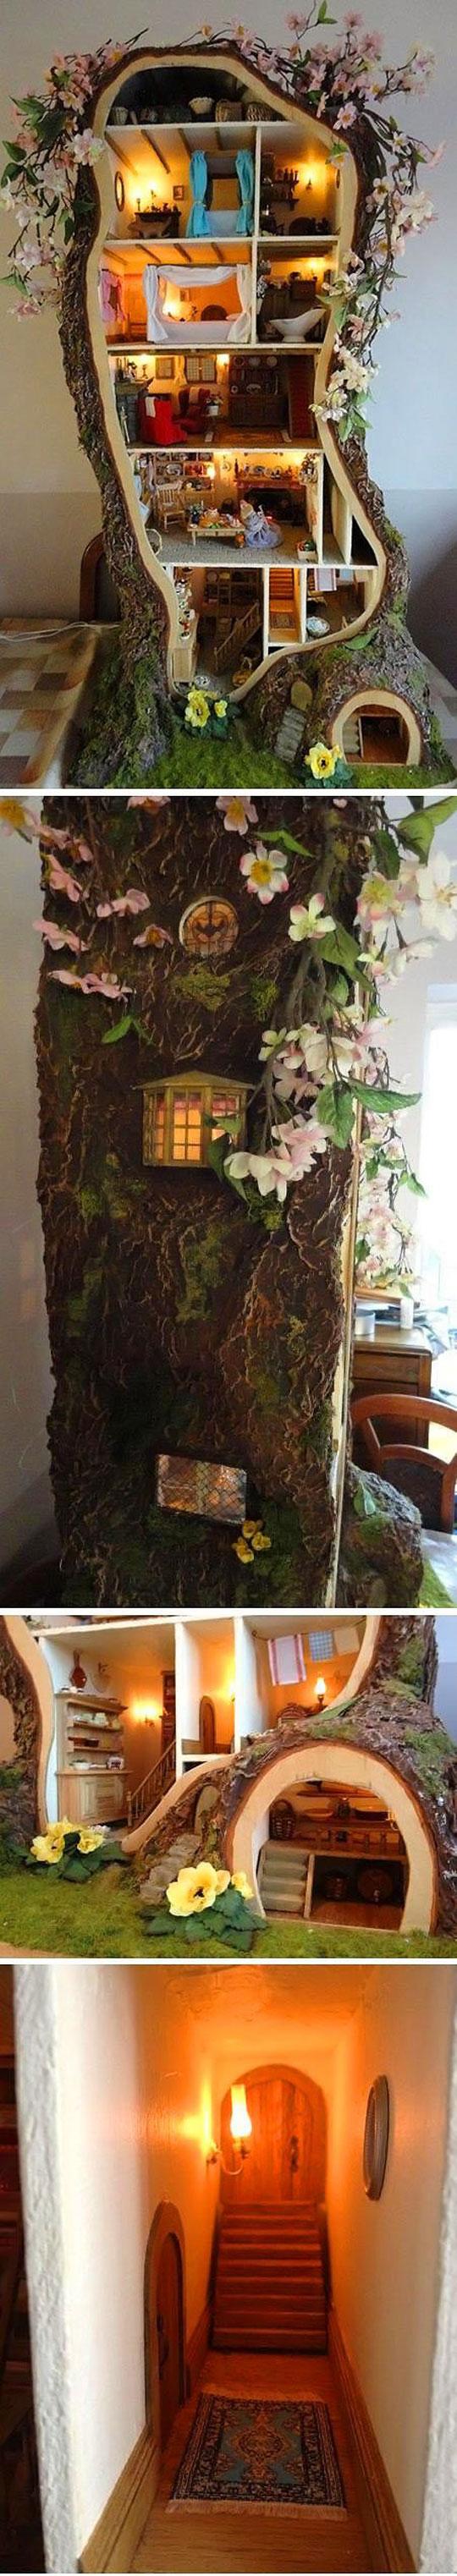 Amazing Miniature Mouse Tree Dolls House